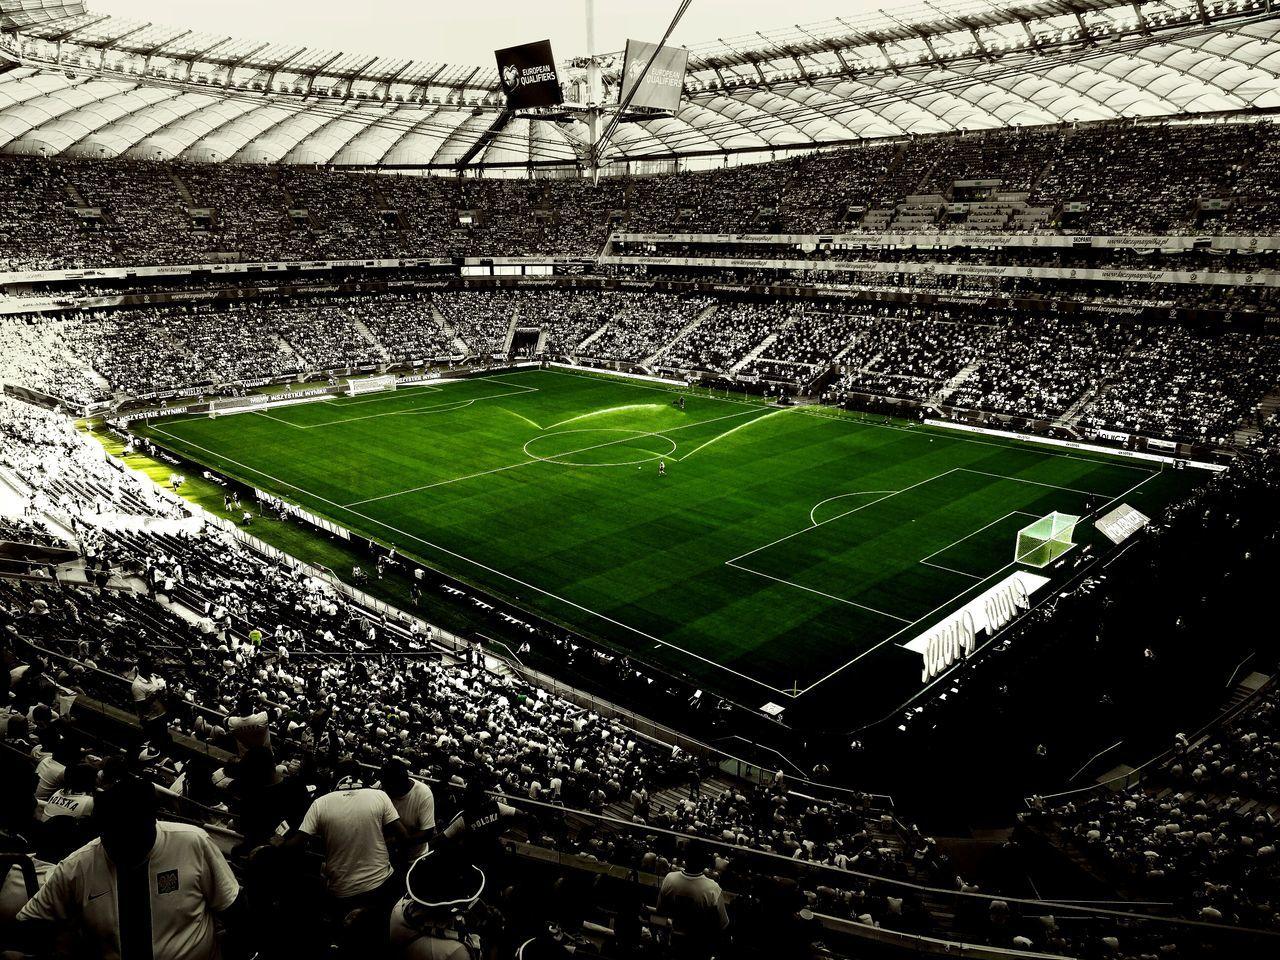 soccer, sport, stadium, football, soccer field, grass, playing field, team sport, day, outdoors, sports team, no people